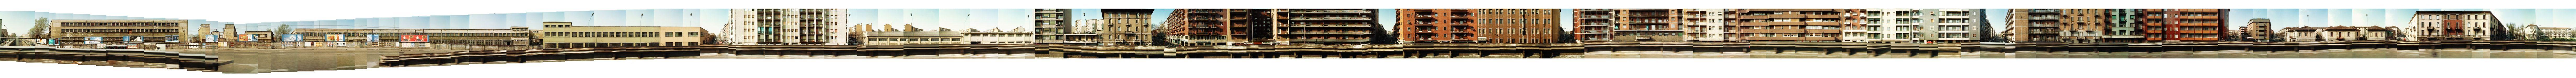 2004strip_dromografia paola di bello